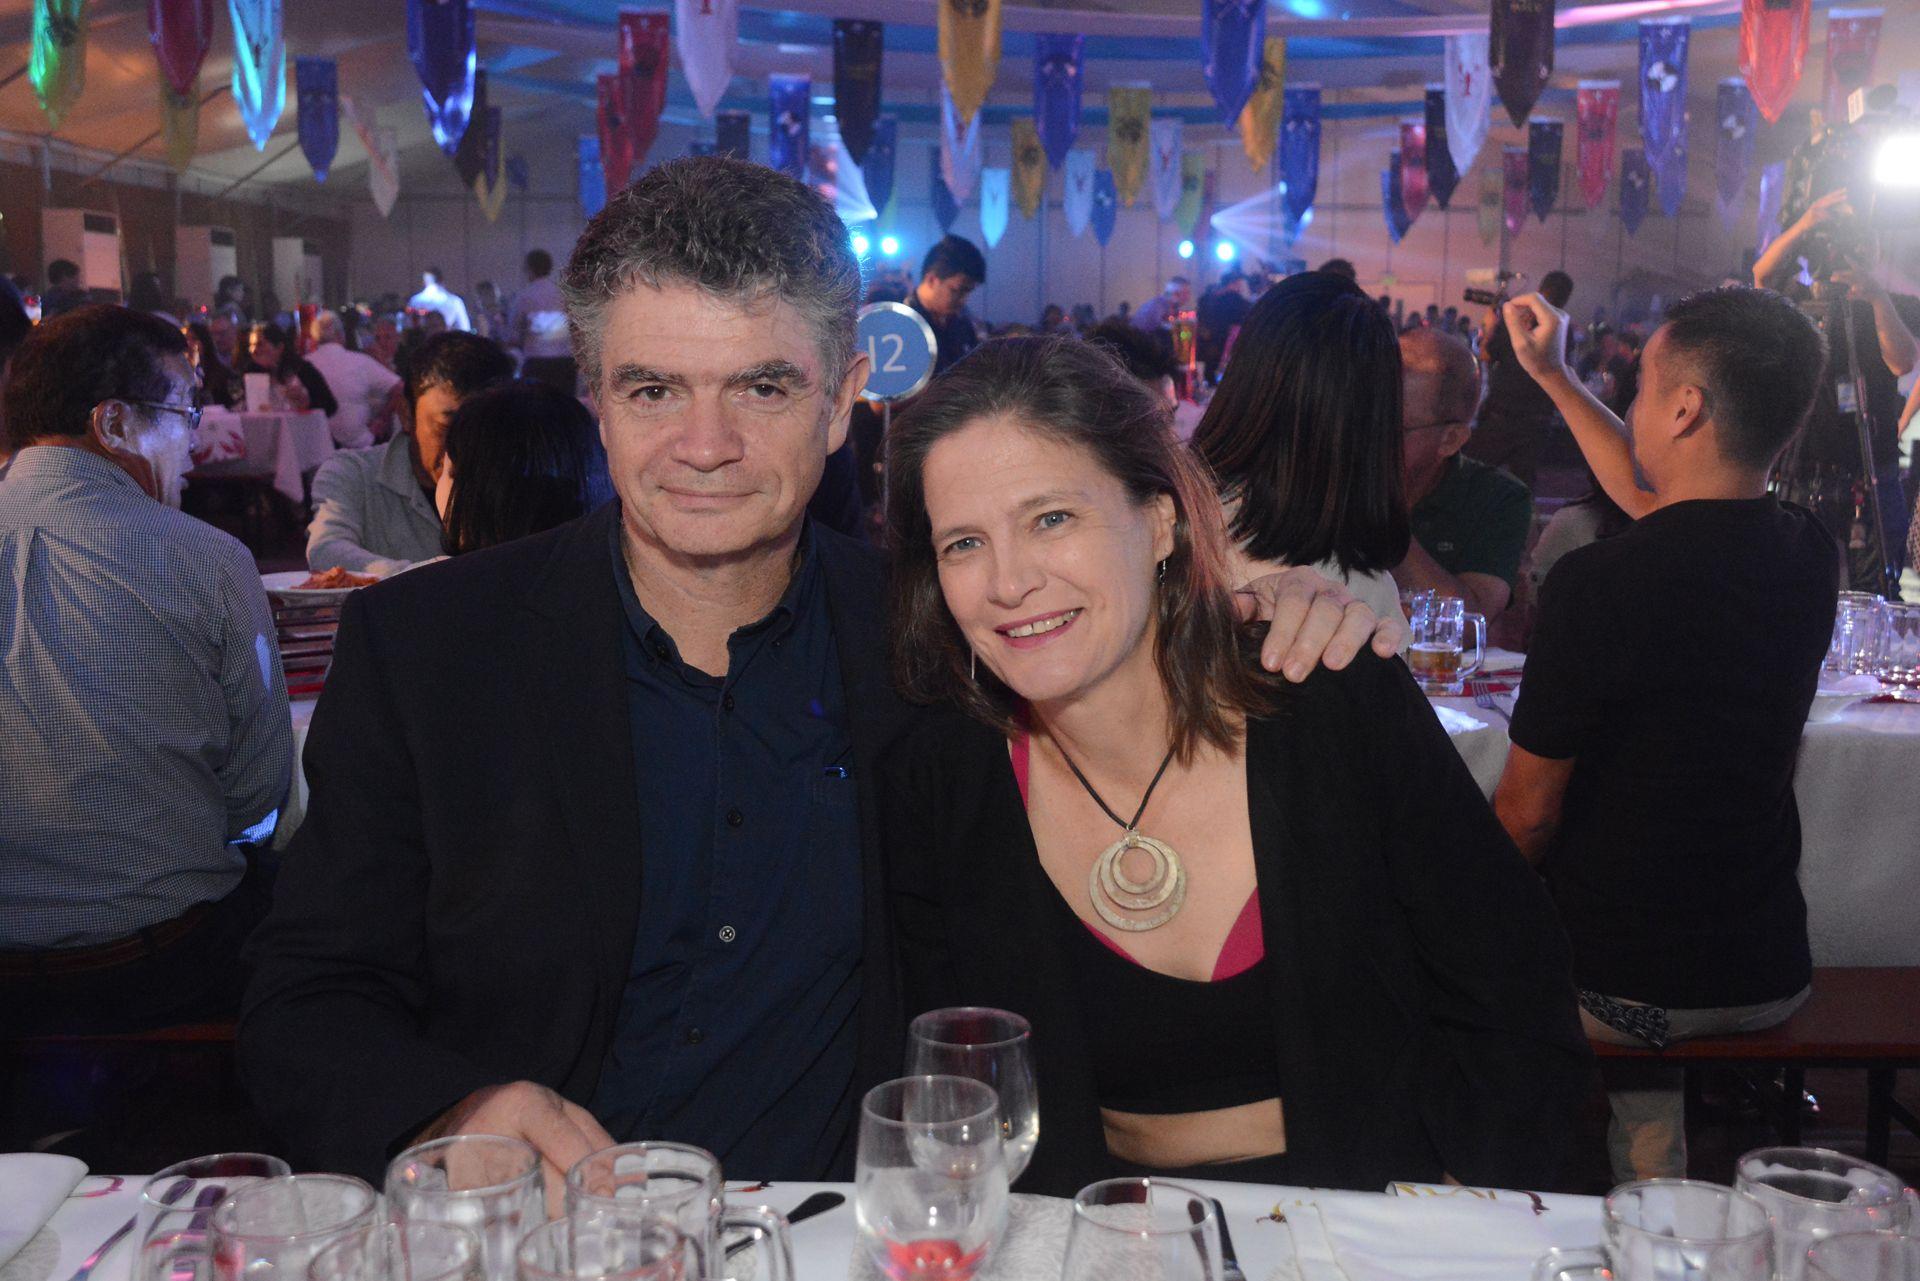 Belgian Ambassador Michel Goffin and Megan Baldwin